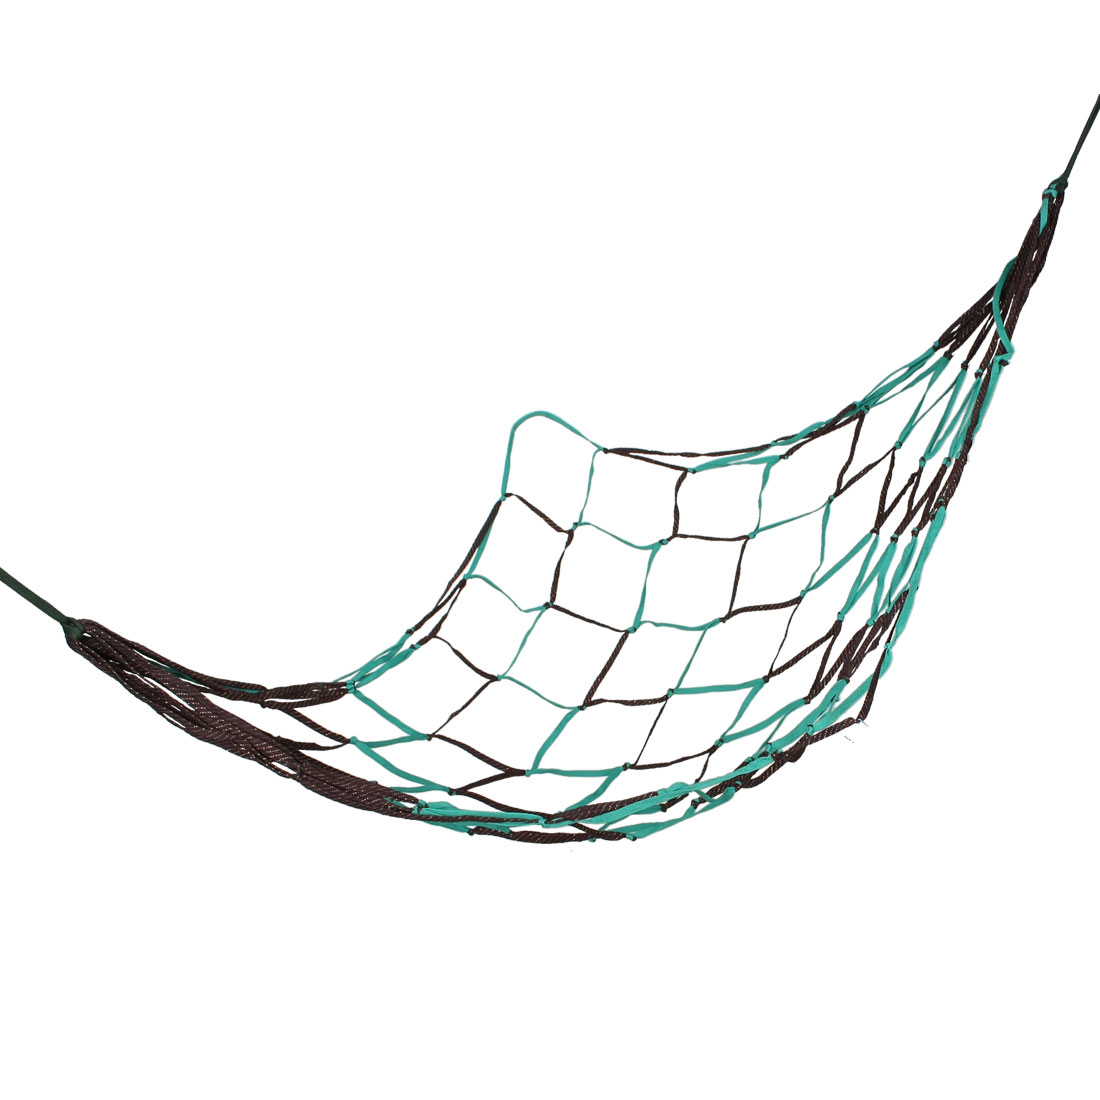 "Outdoor Swing Nylon Mesh Hammock Net Teal Green Coffee Color 75"" x 28"""